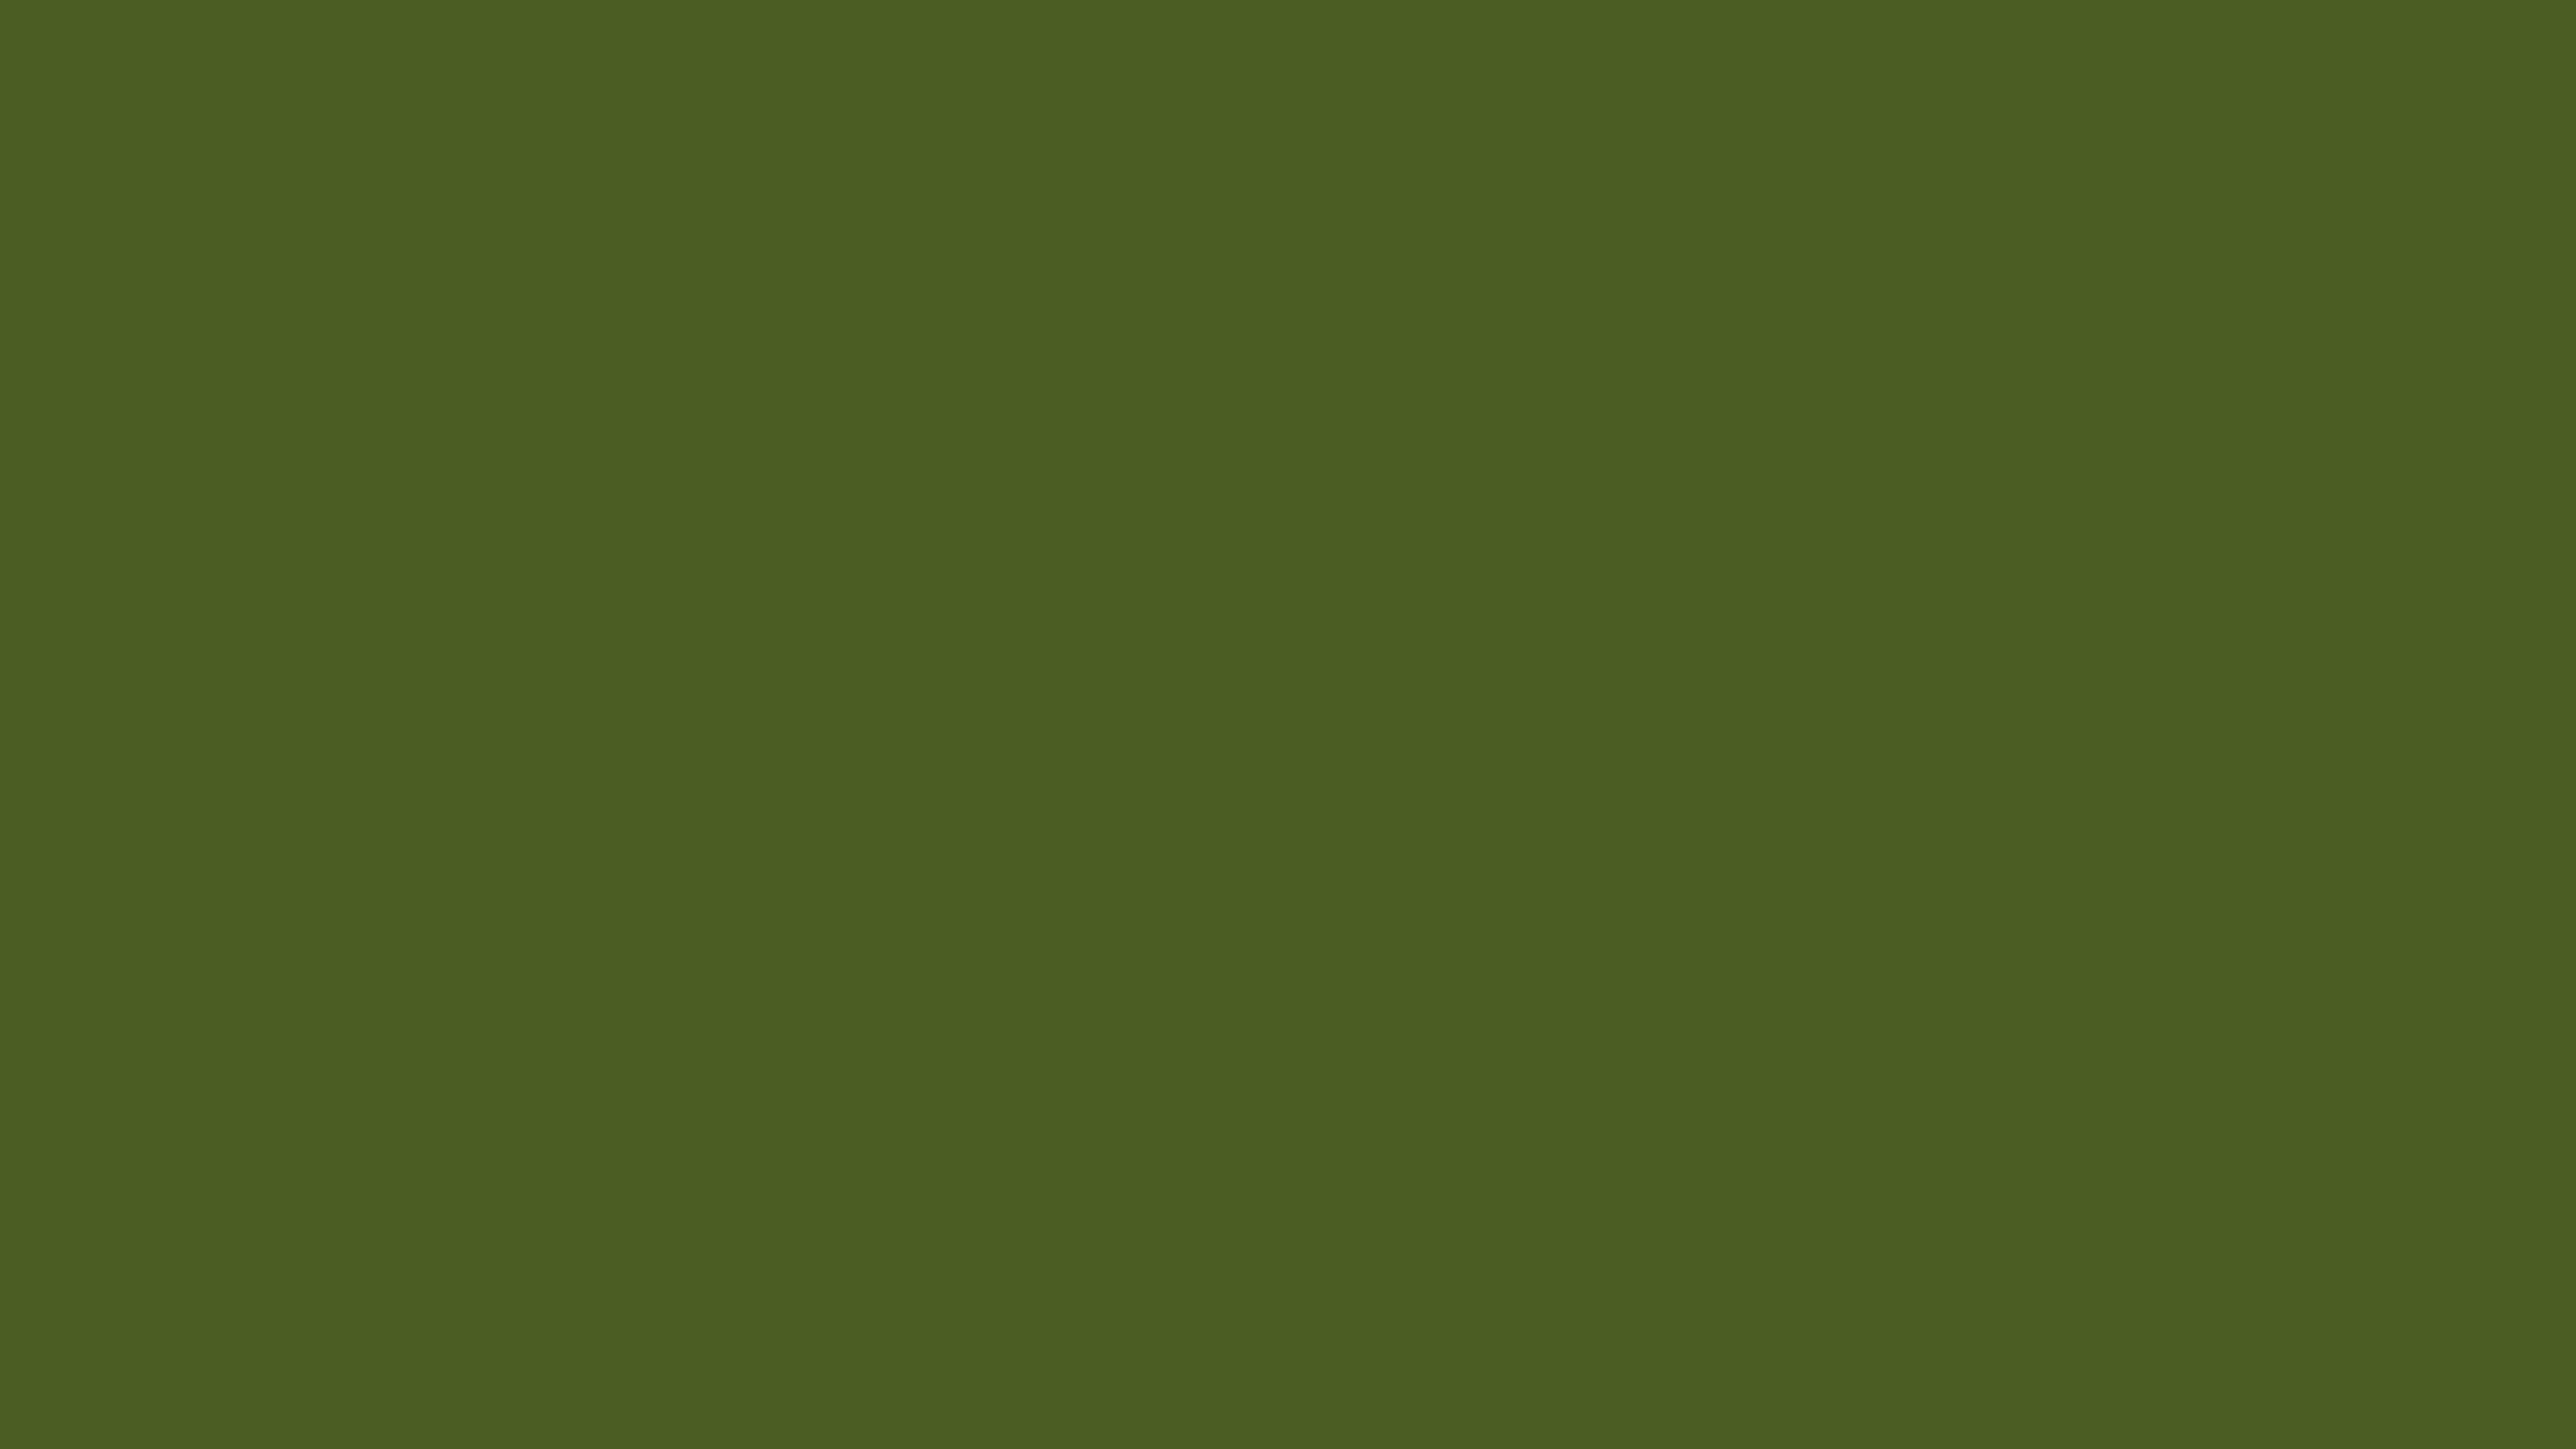 resolution dark moss green - photo #14